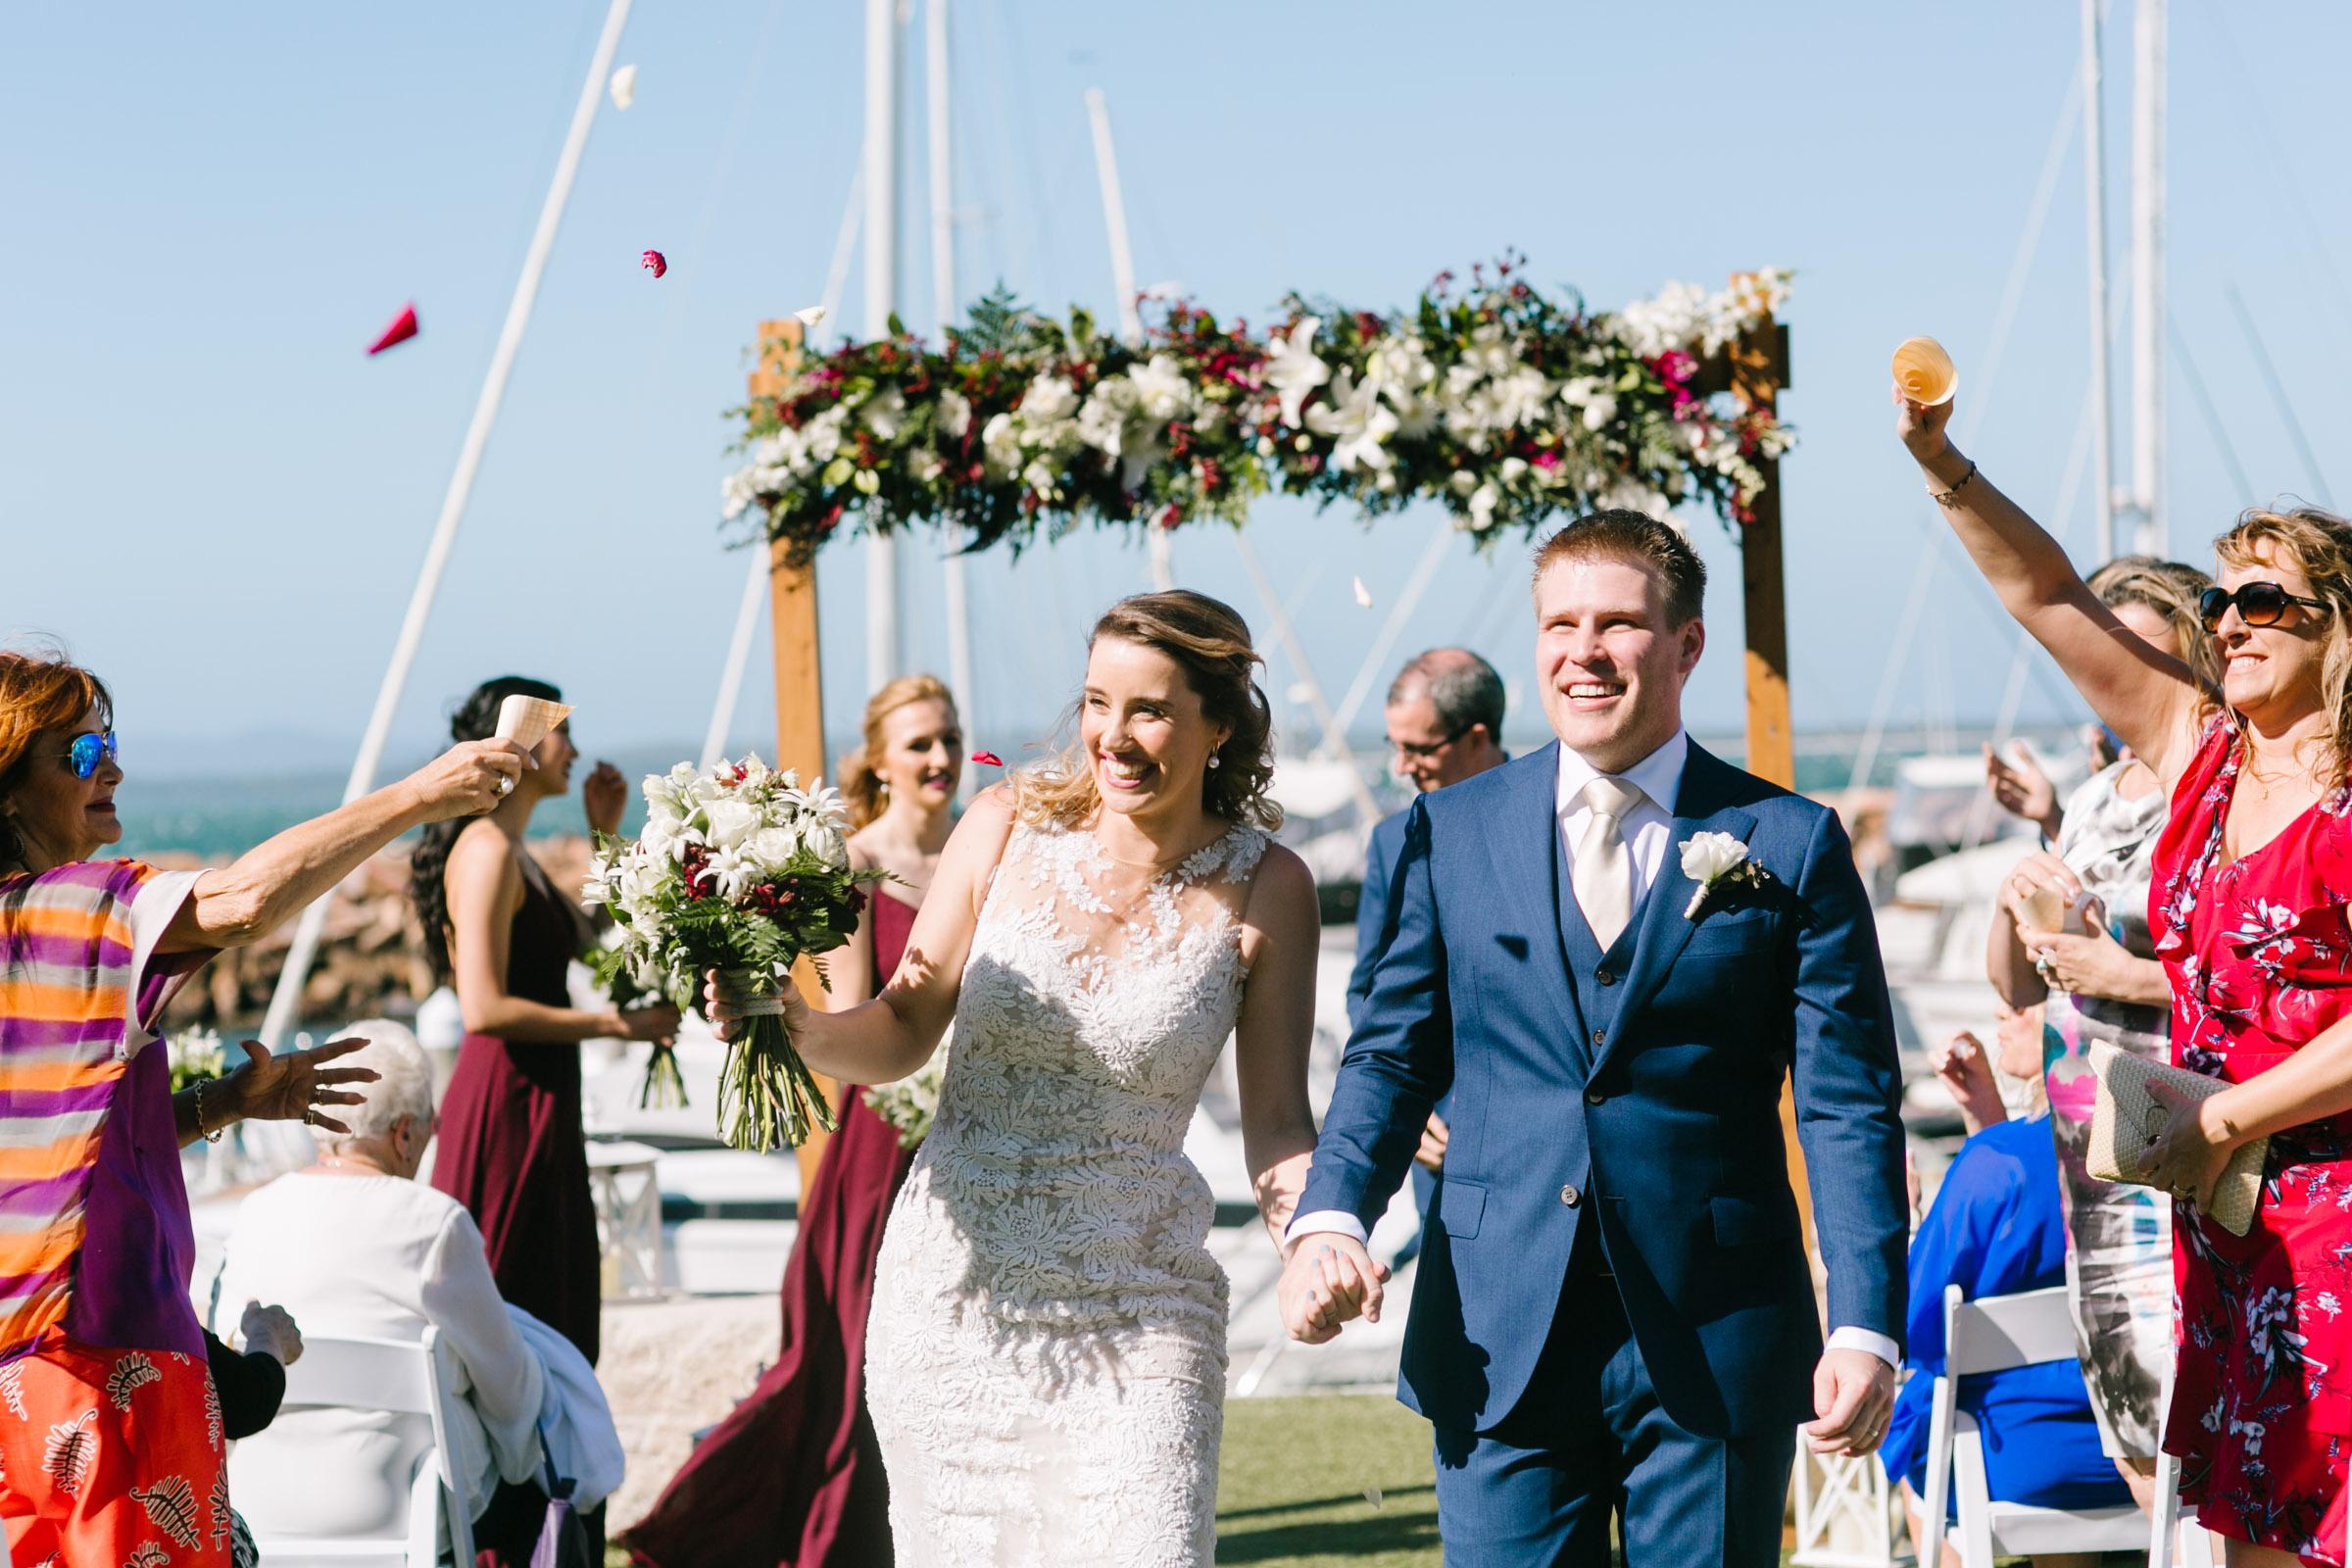 Bec Essery Wedding Photography